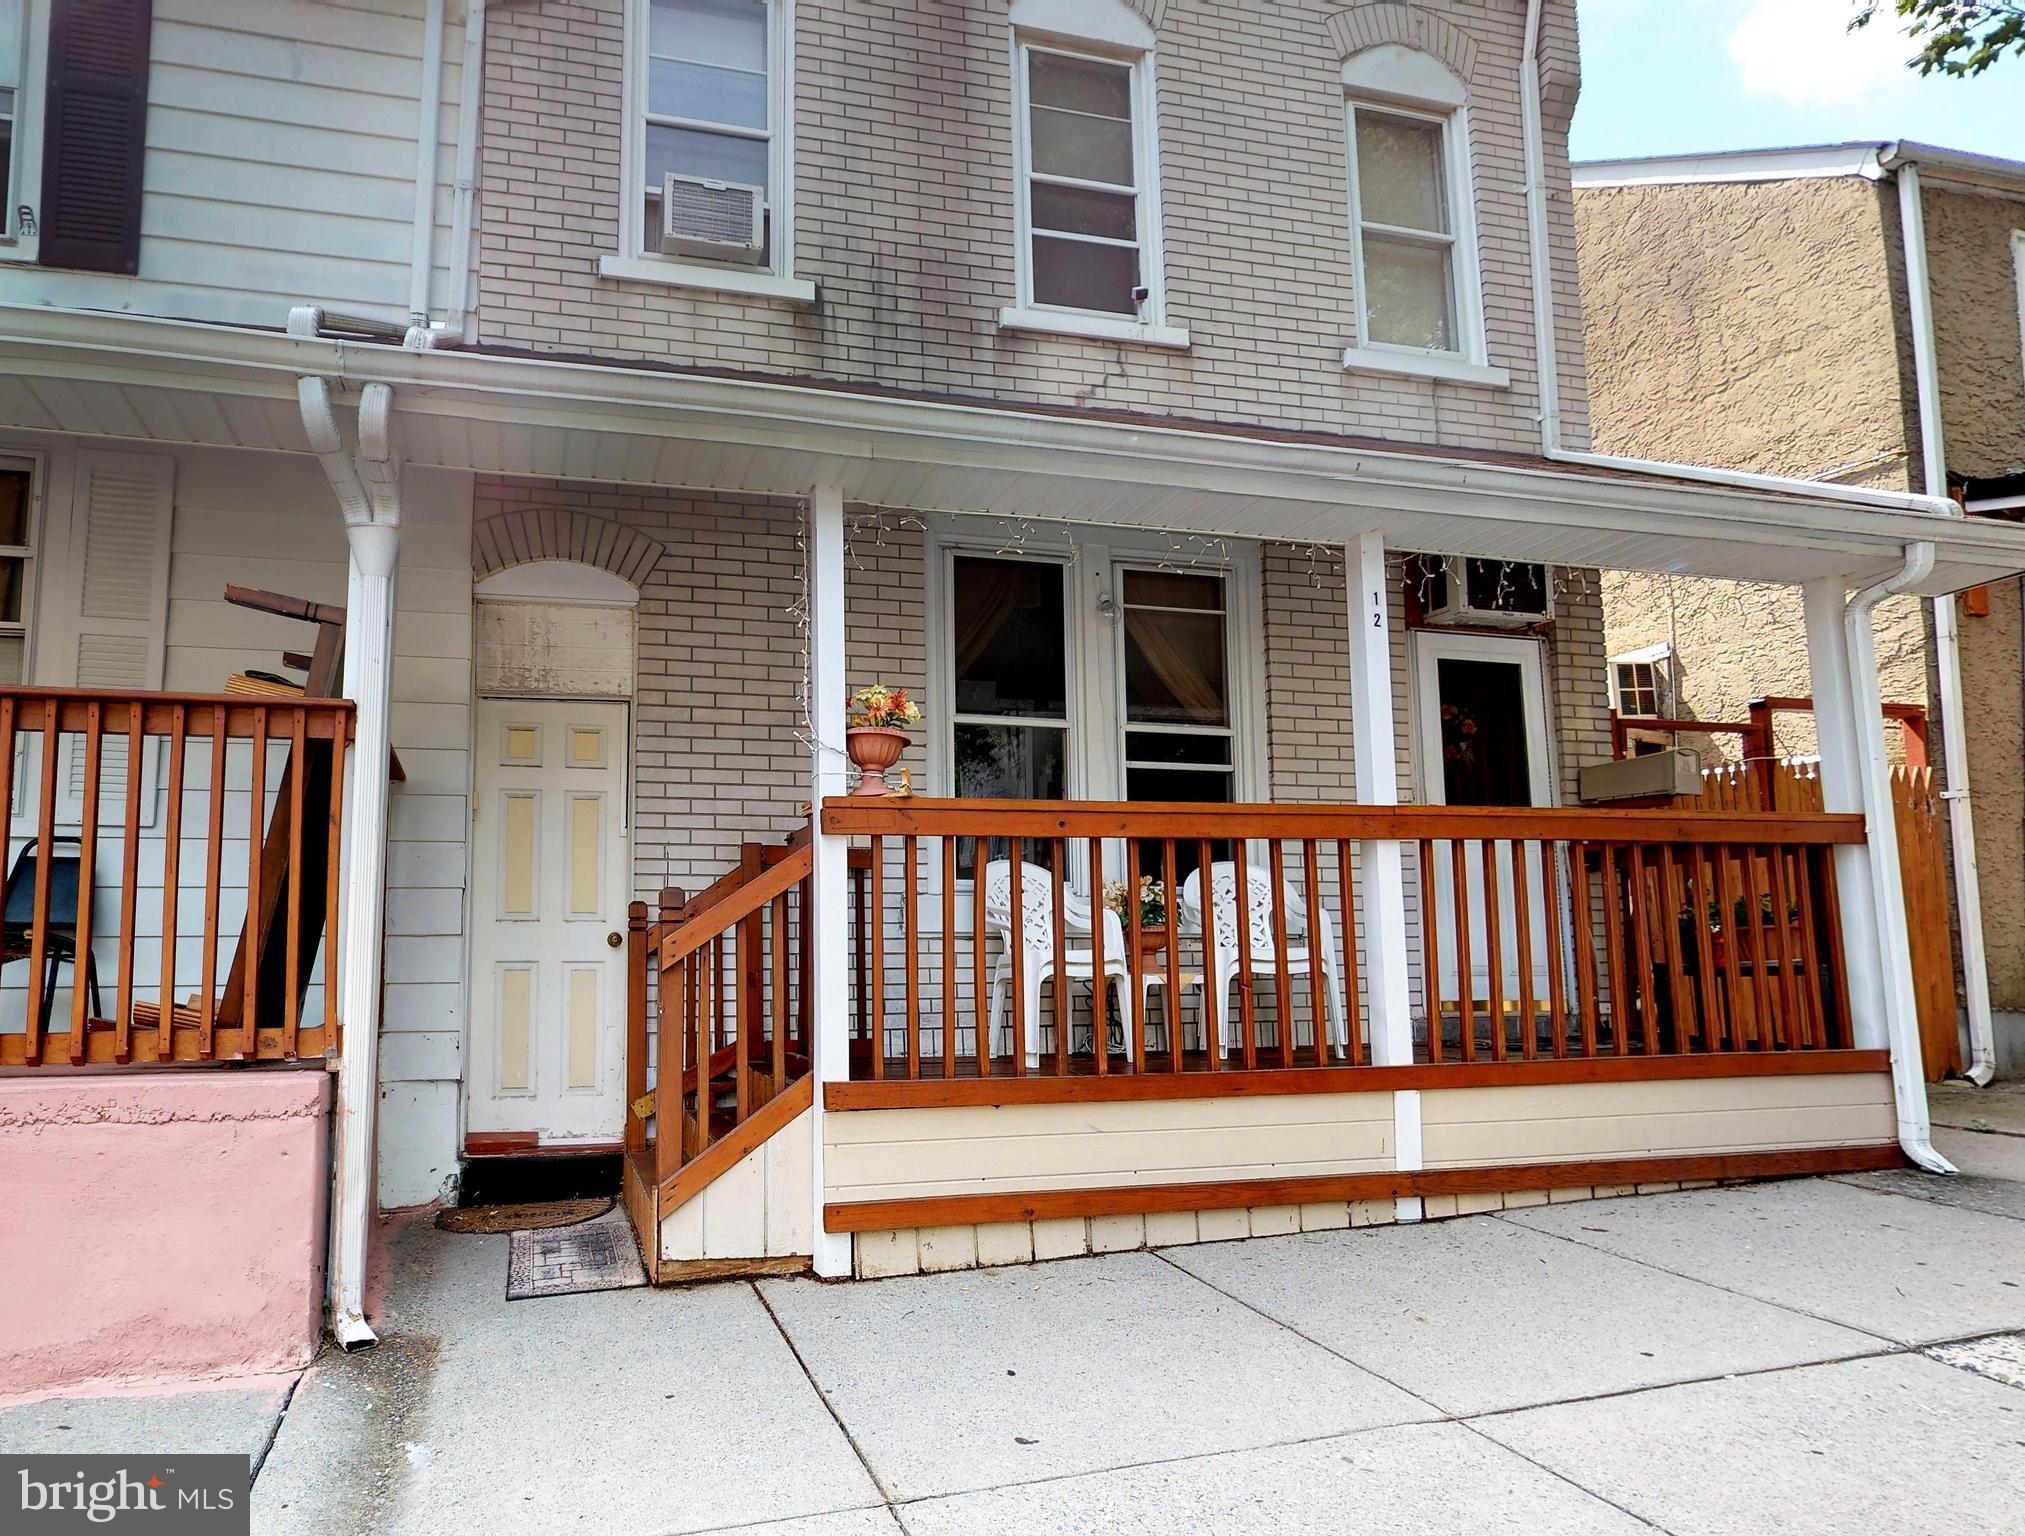 412 GRANT STREET, ALLENTOWN, PA 18102